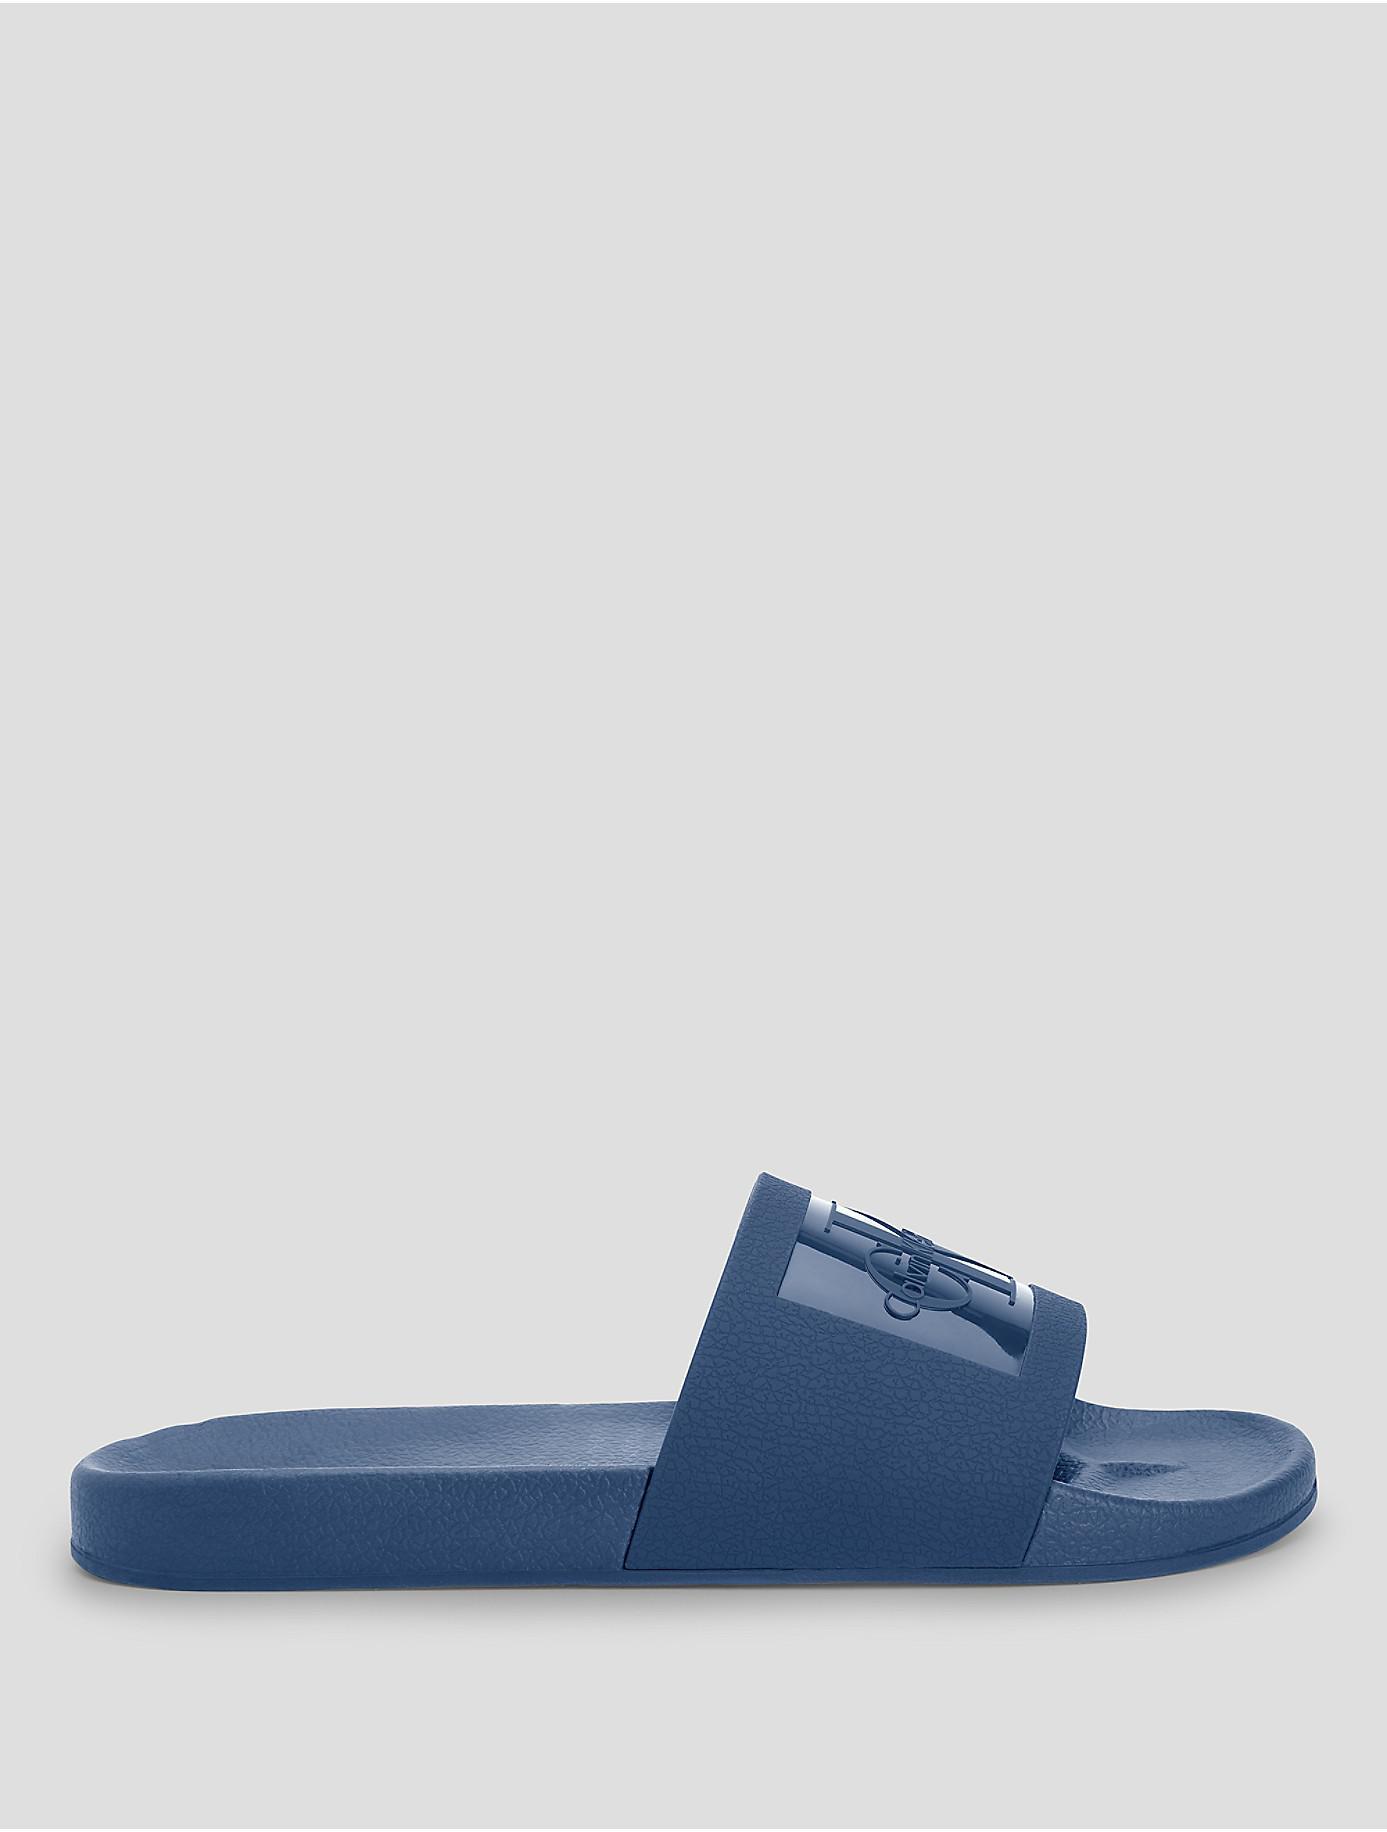 953fb6797b26 Lyst - Calvin Klein 205W39Nyc Vincenzo Logo Sandal in Blue for Men